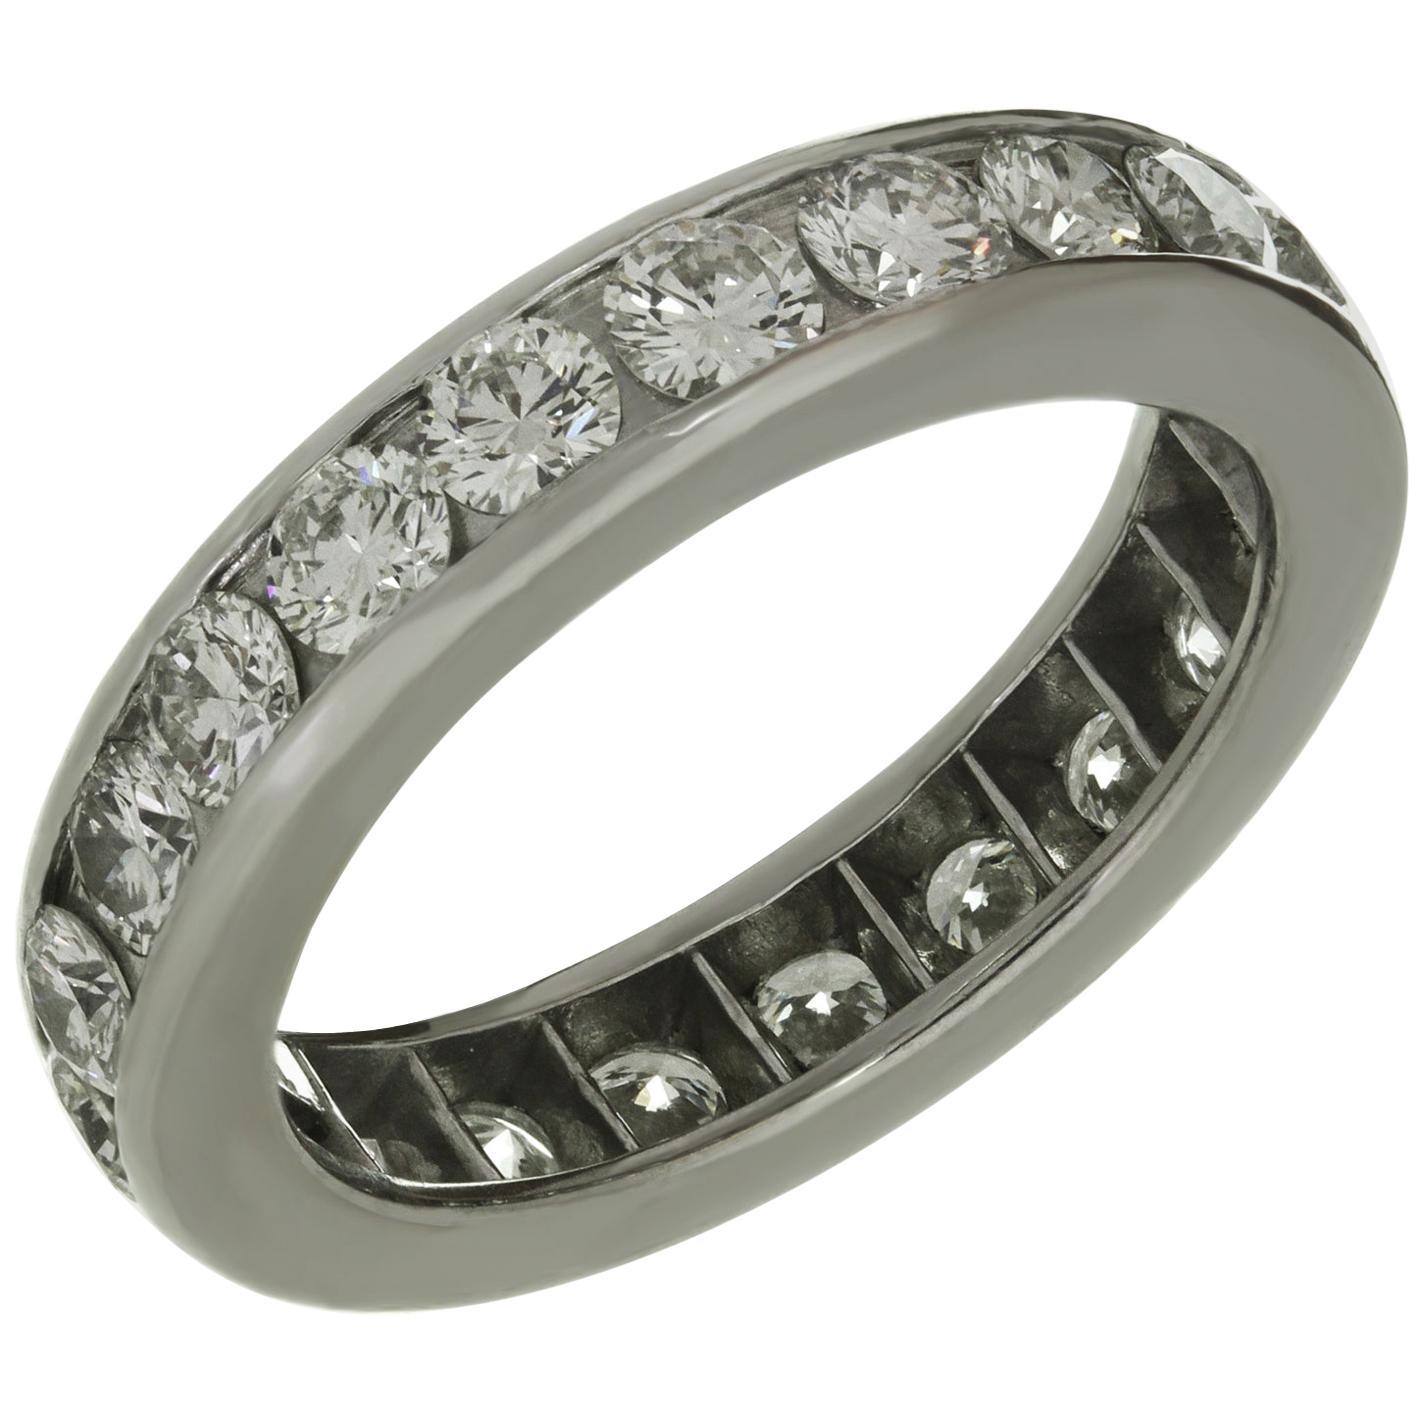 Tiffany & Co. Diamond Platinum Eternity Band Ring